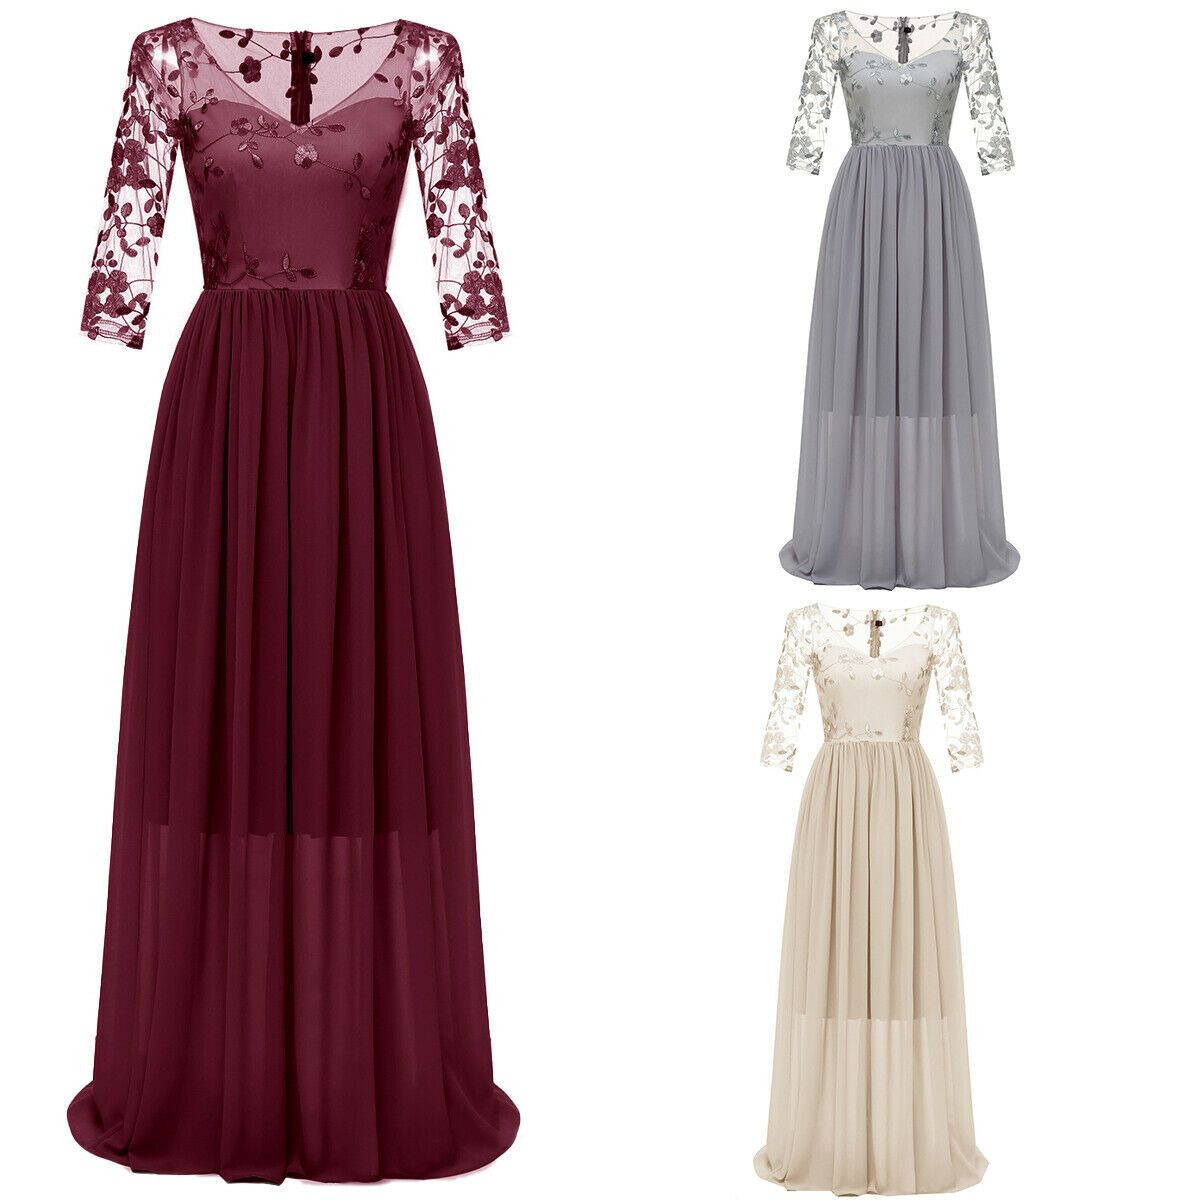 13 Coolste Abendkleid Festlich Lang BoutiqueFormal Kreativ Abendkleid Festlich Lang Bester Preis